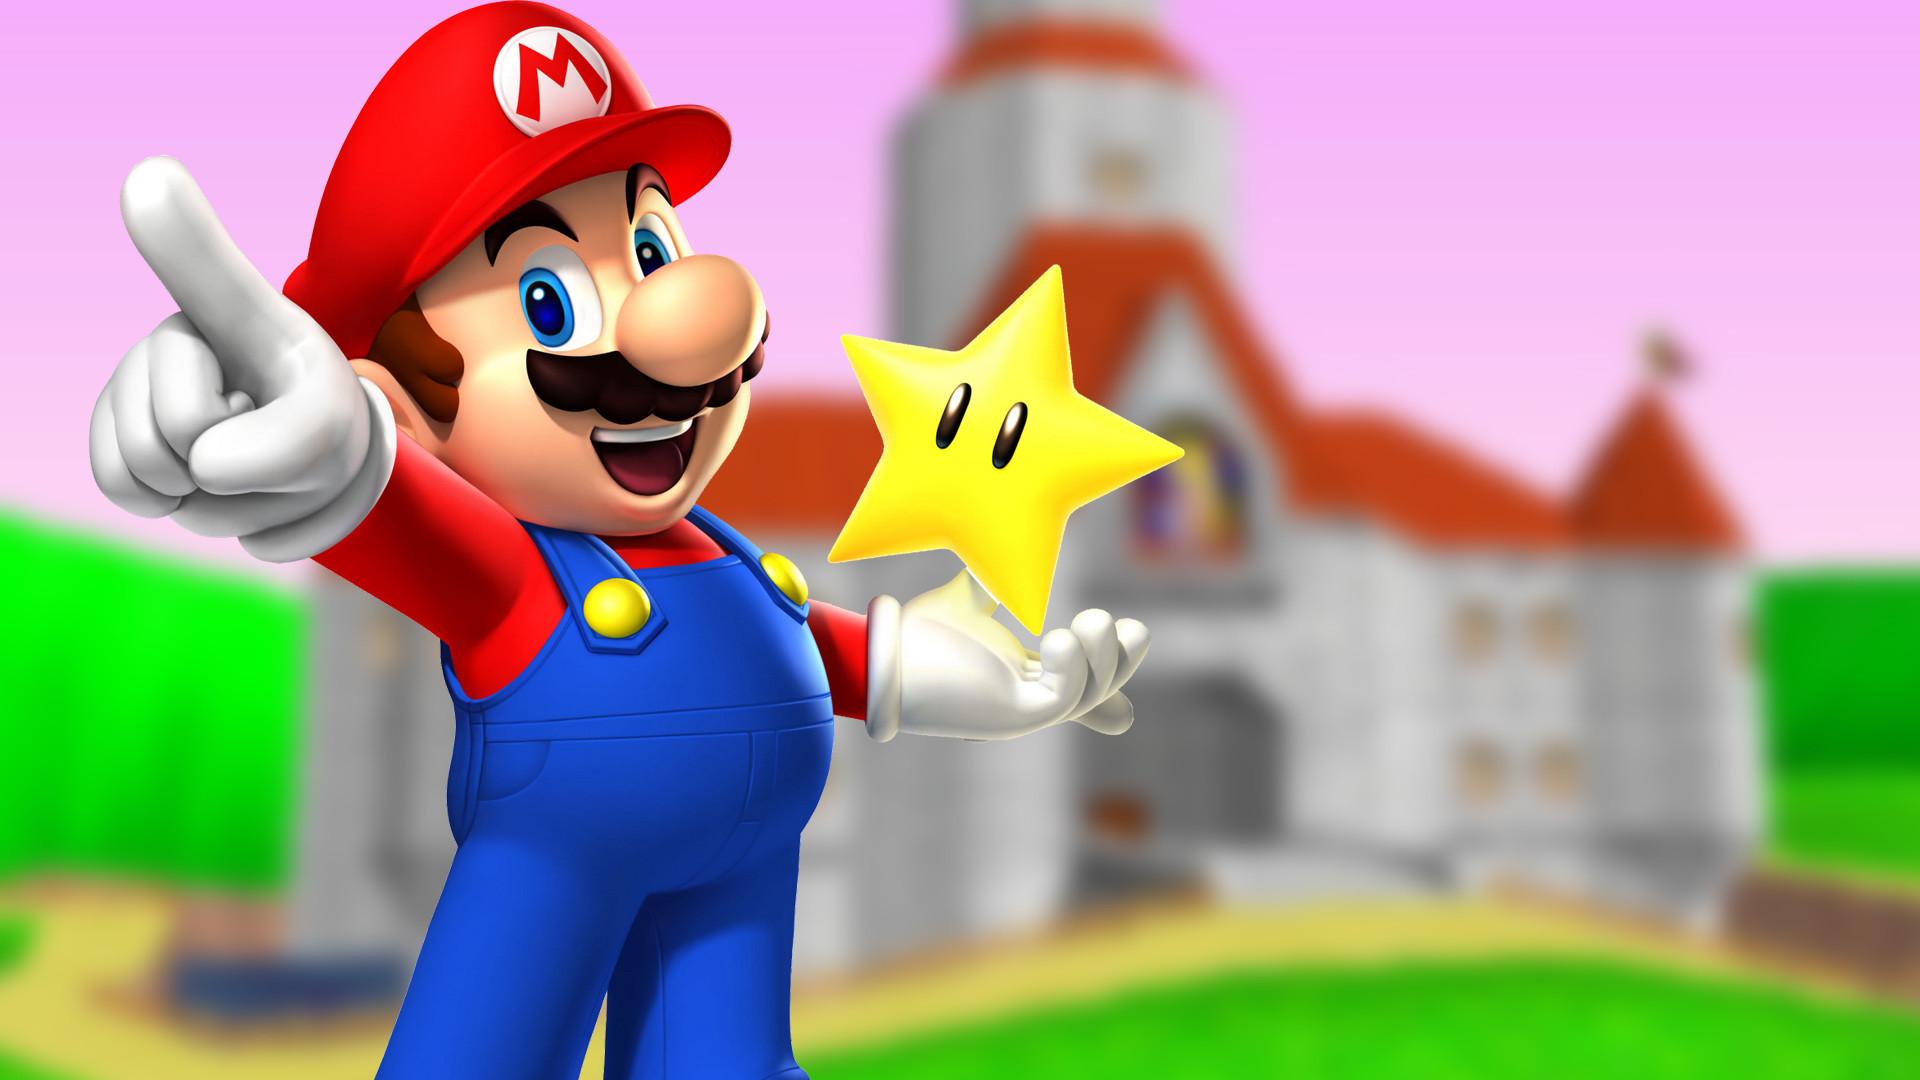 Syfy – Nintendo fans turned Super Mario 64 into an online multiplayer game  | Nintendo fans turned Super Mario 64 into an online multiplayer game